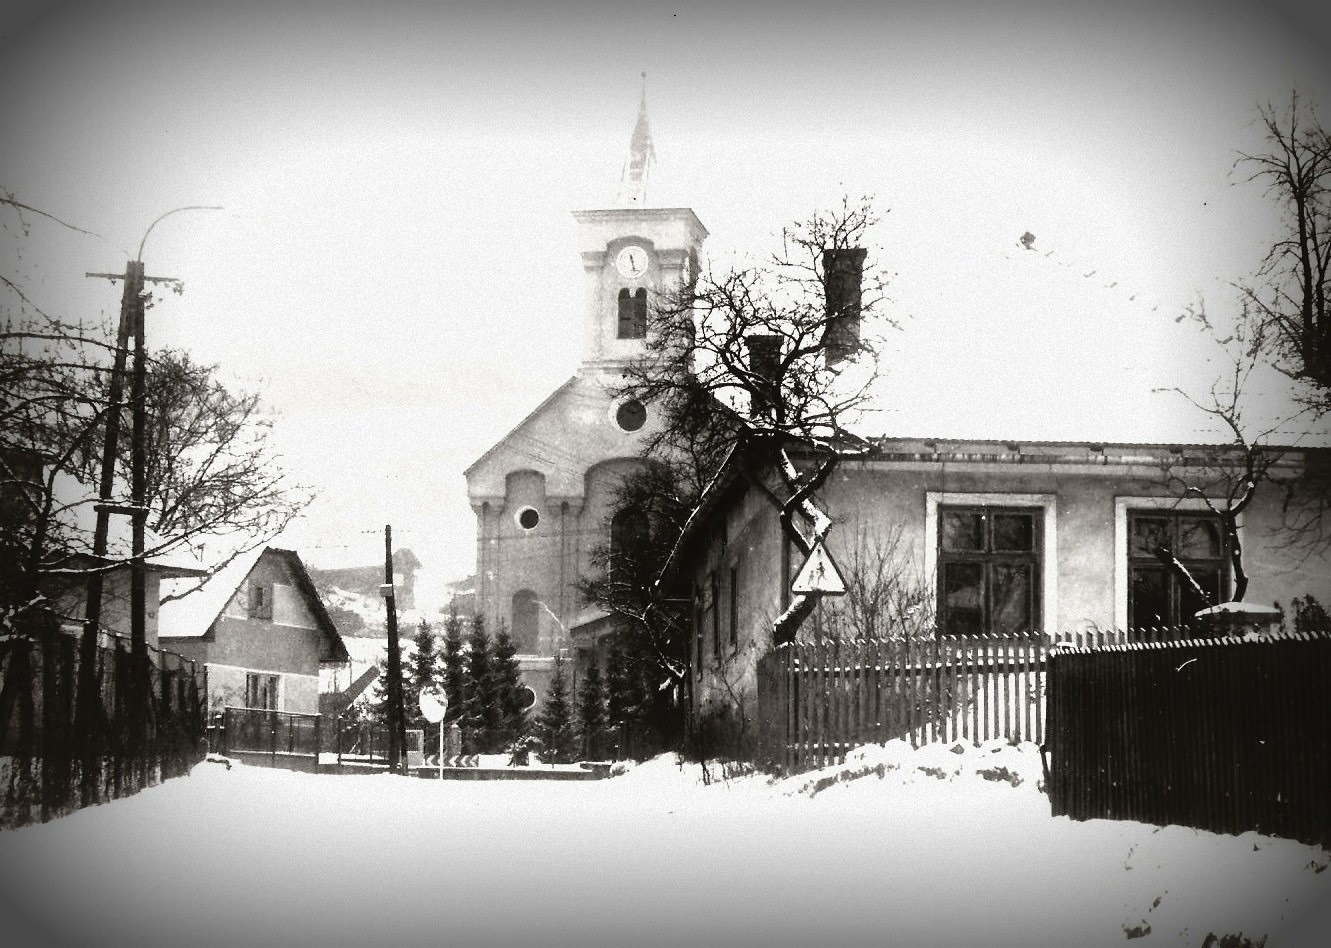 centrum obce Lazy pod Makytou so starou cestou a evanjelickým kostolom v roku 1970 z archívu pána M. Krečmera